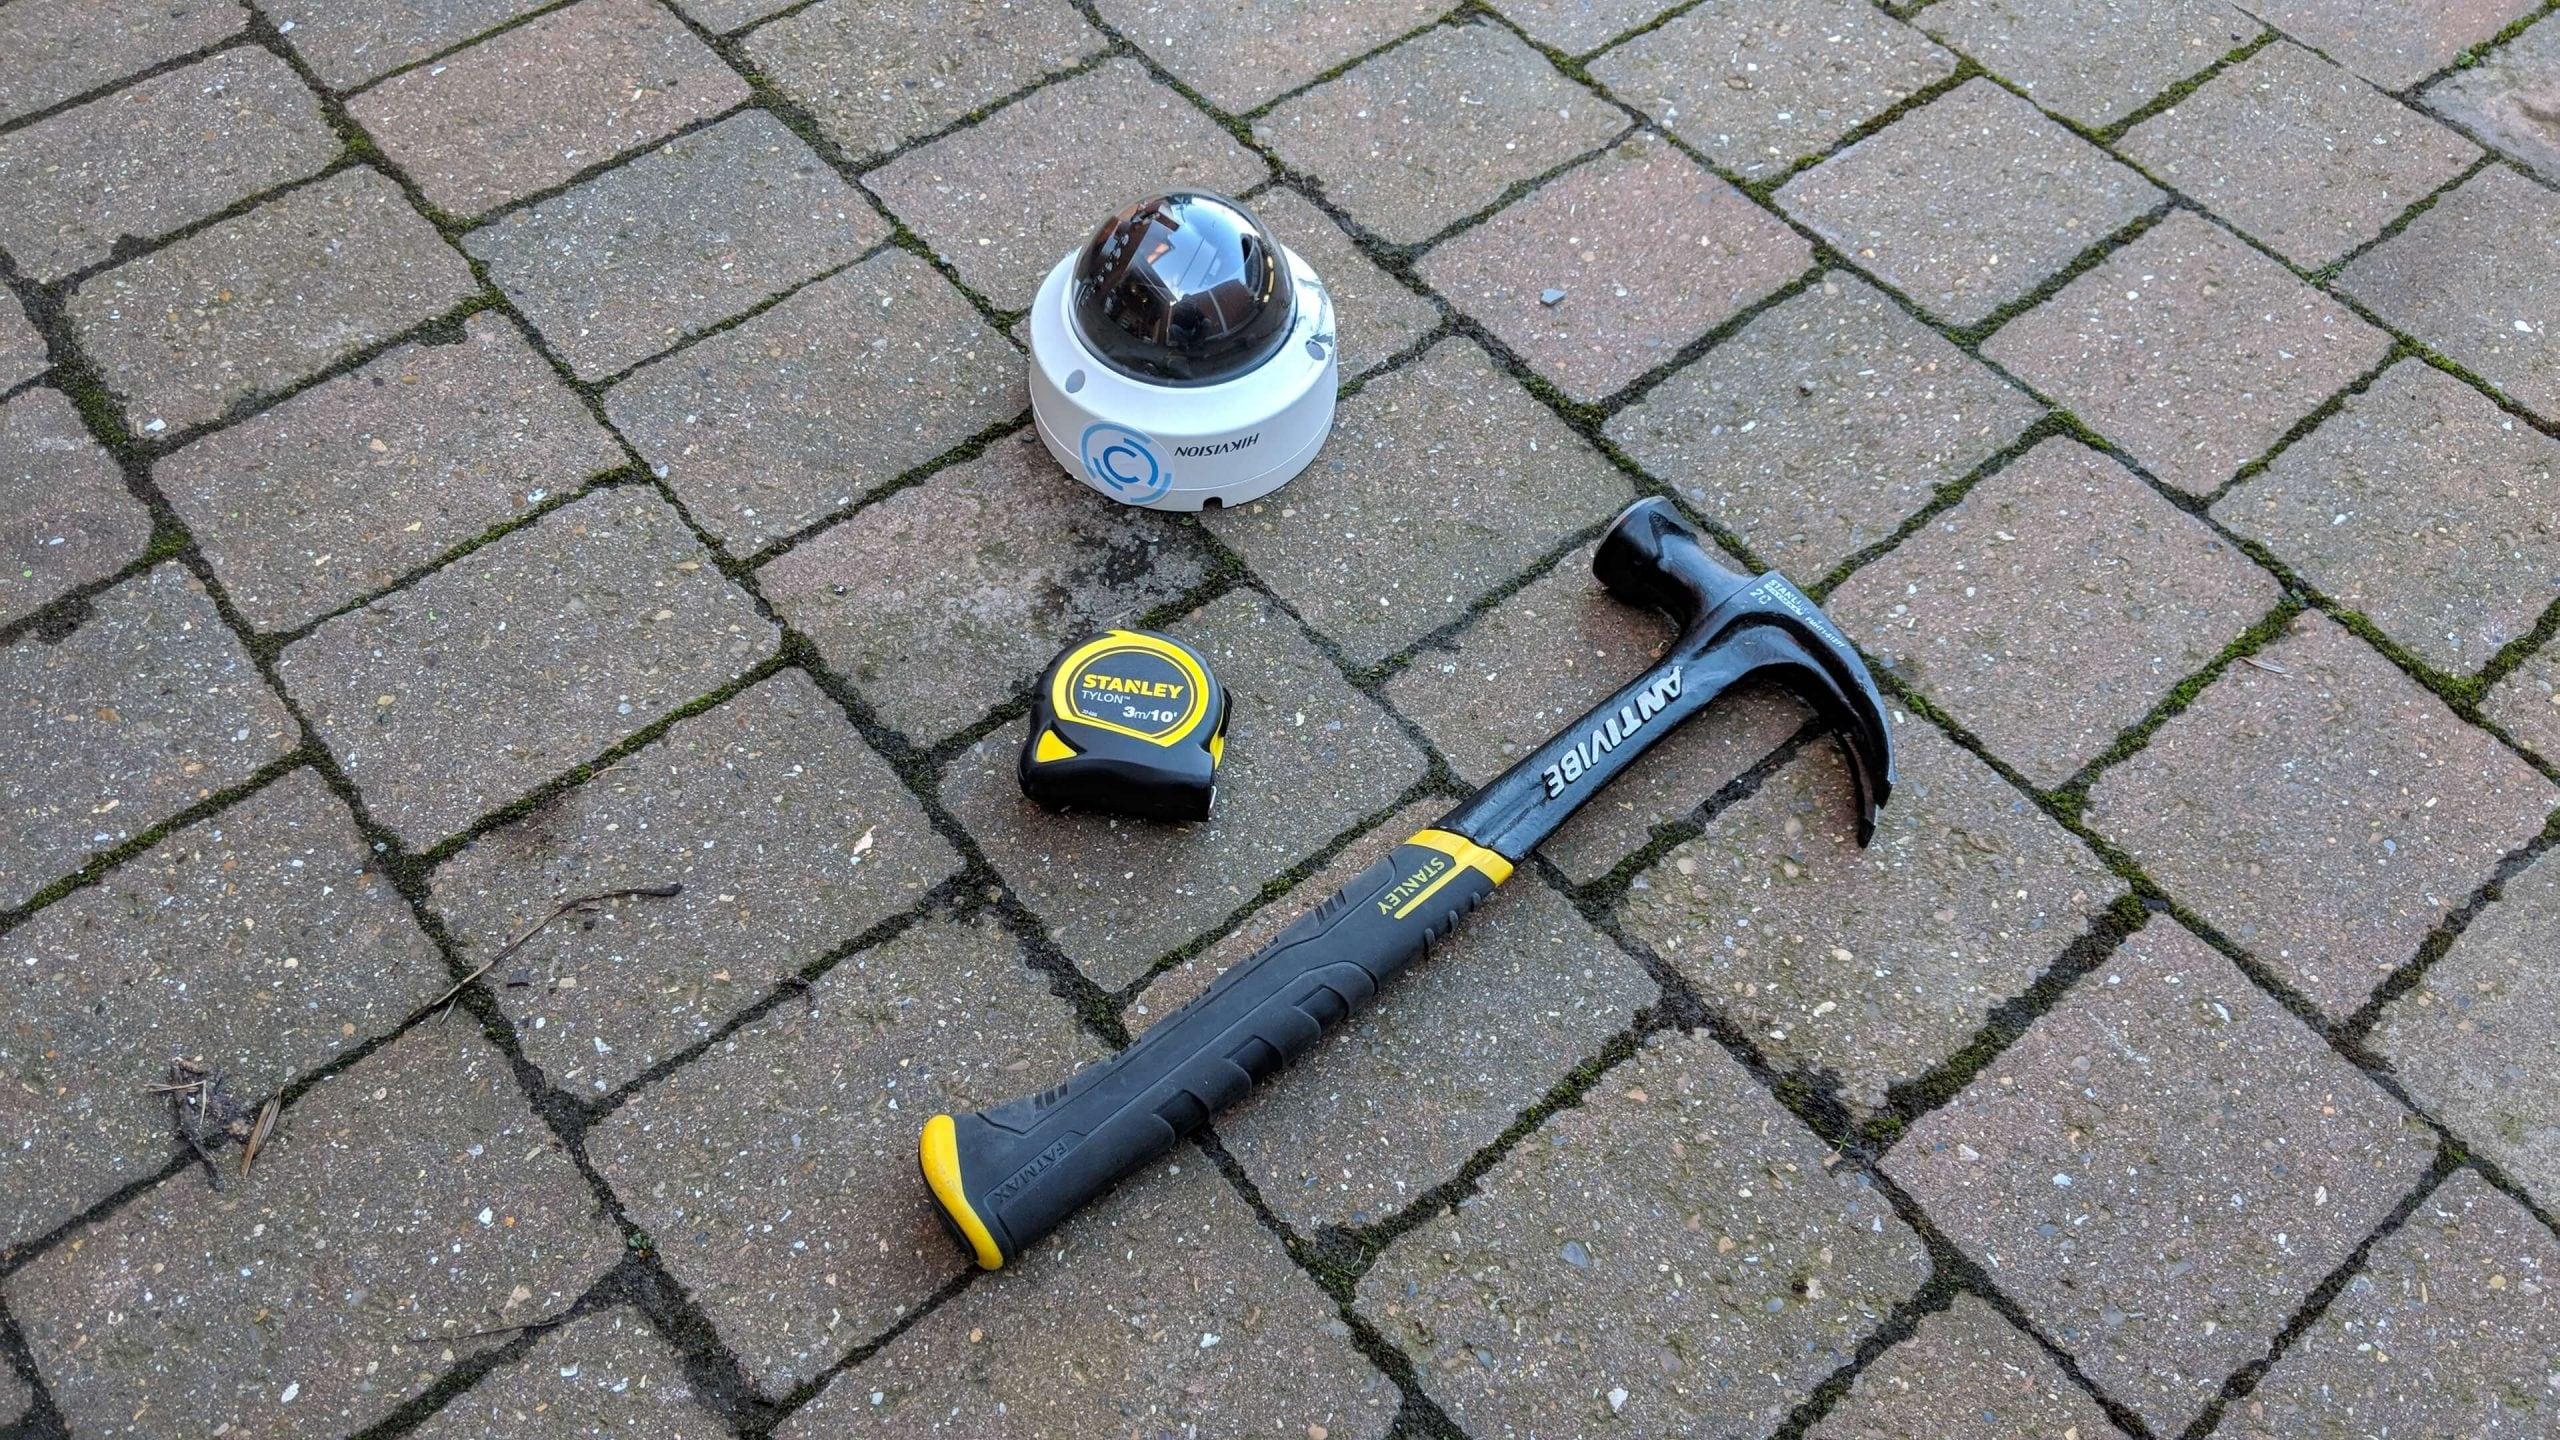 Hikvision Dome Camera Vandal Proof Test